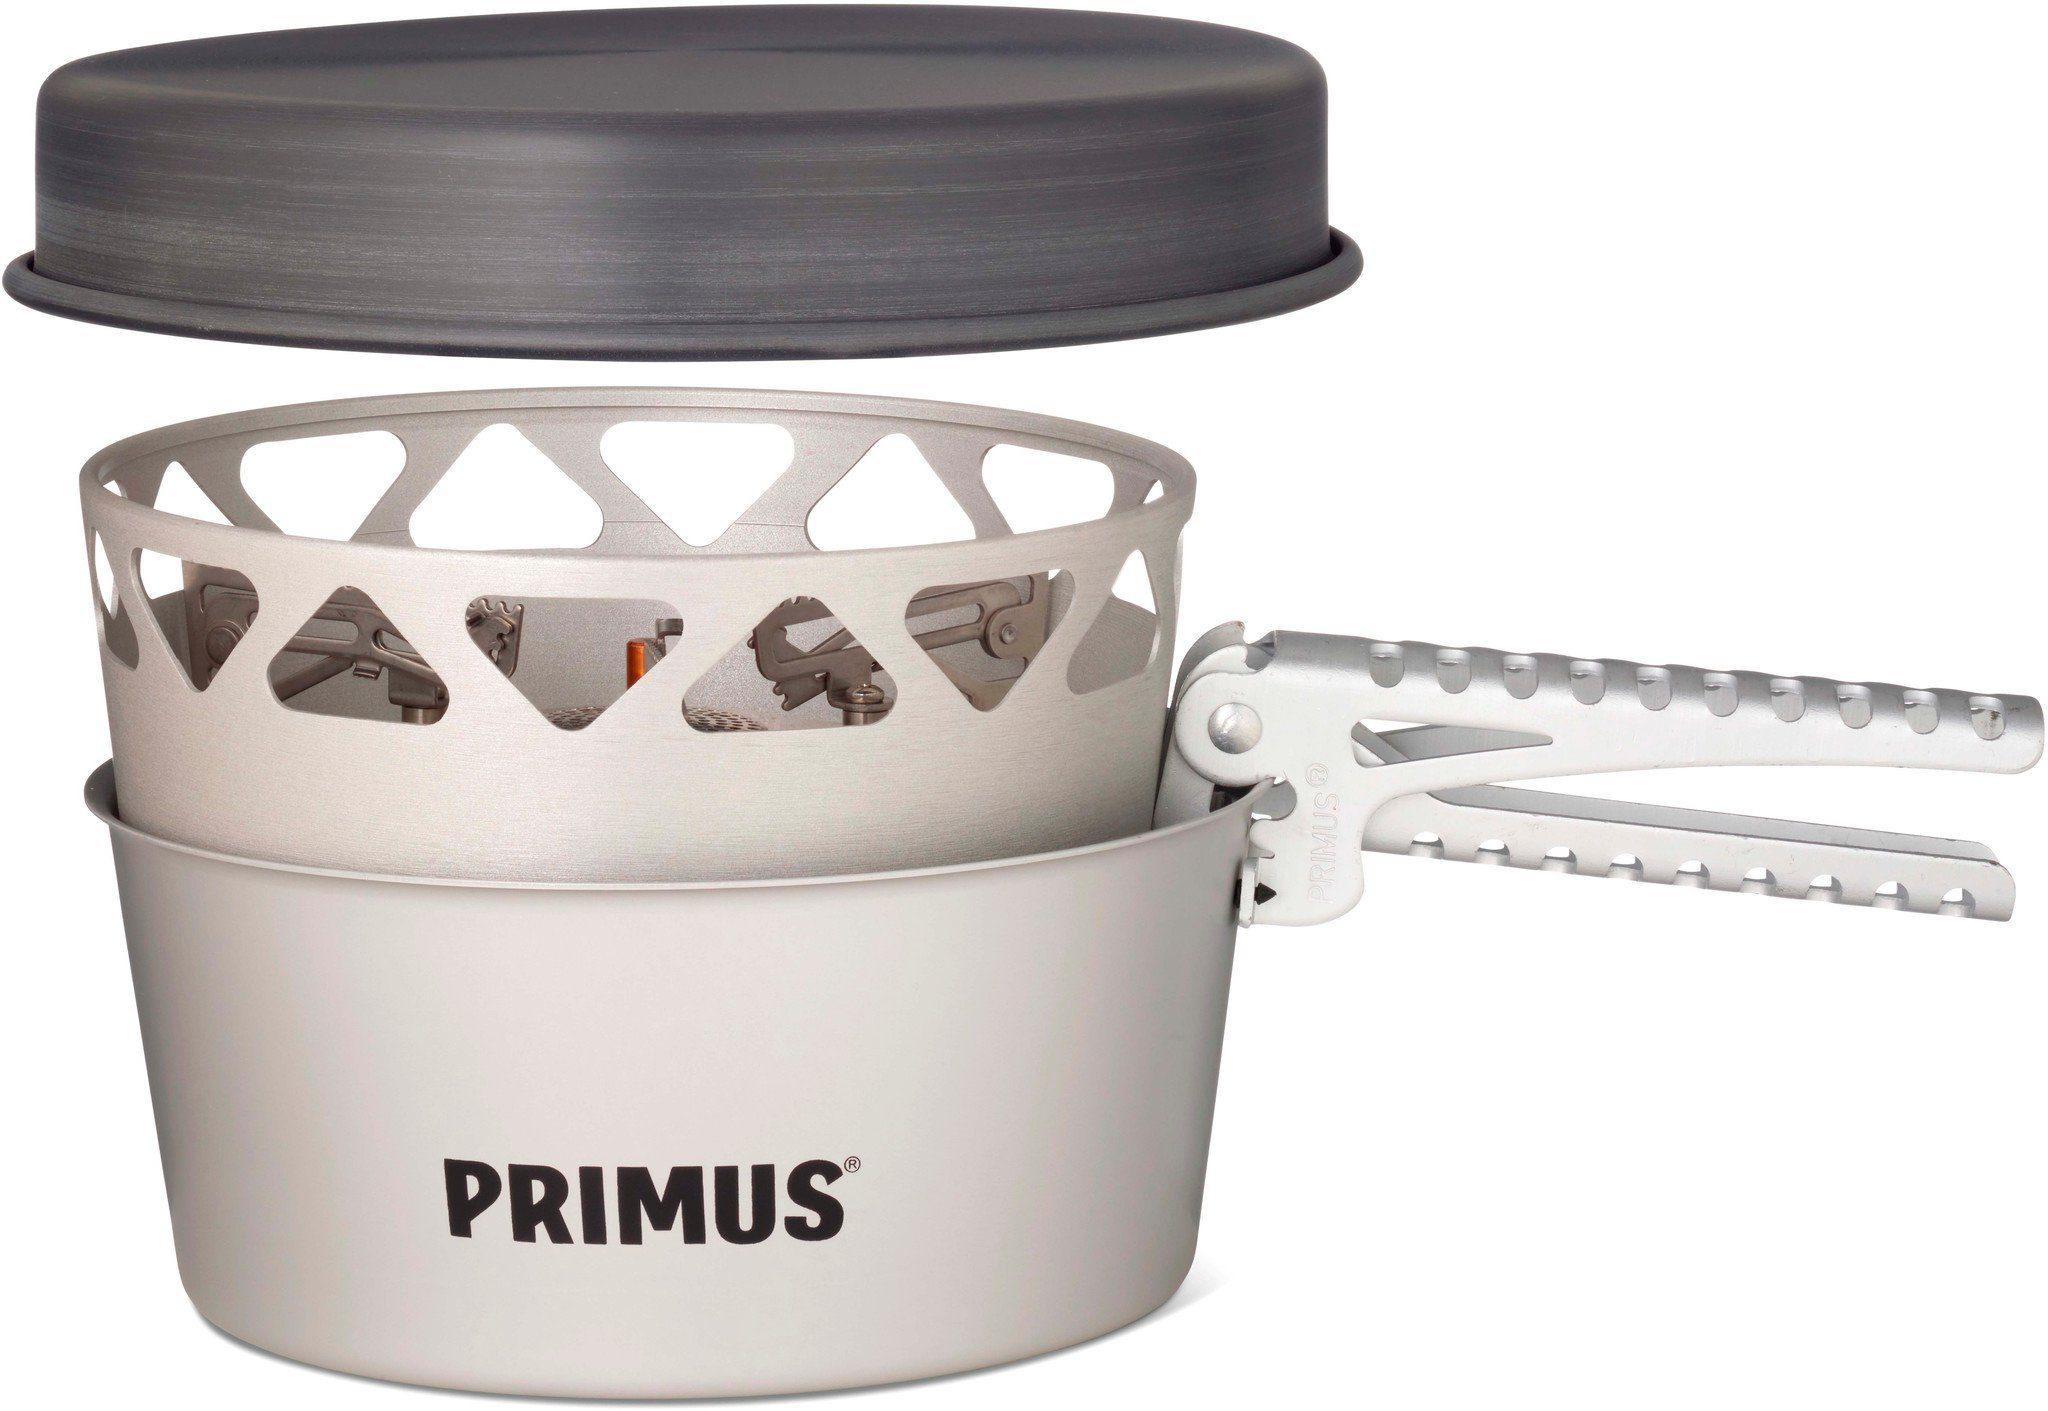 Primus Camping-Kocher »Essential Stove Set 1300ml«